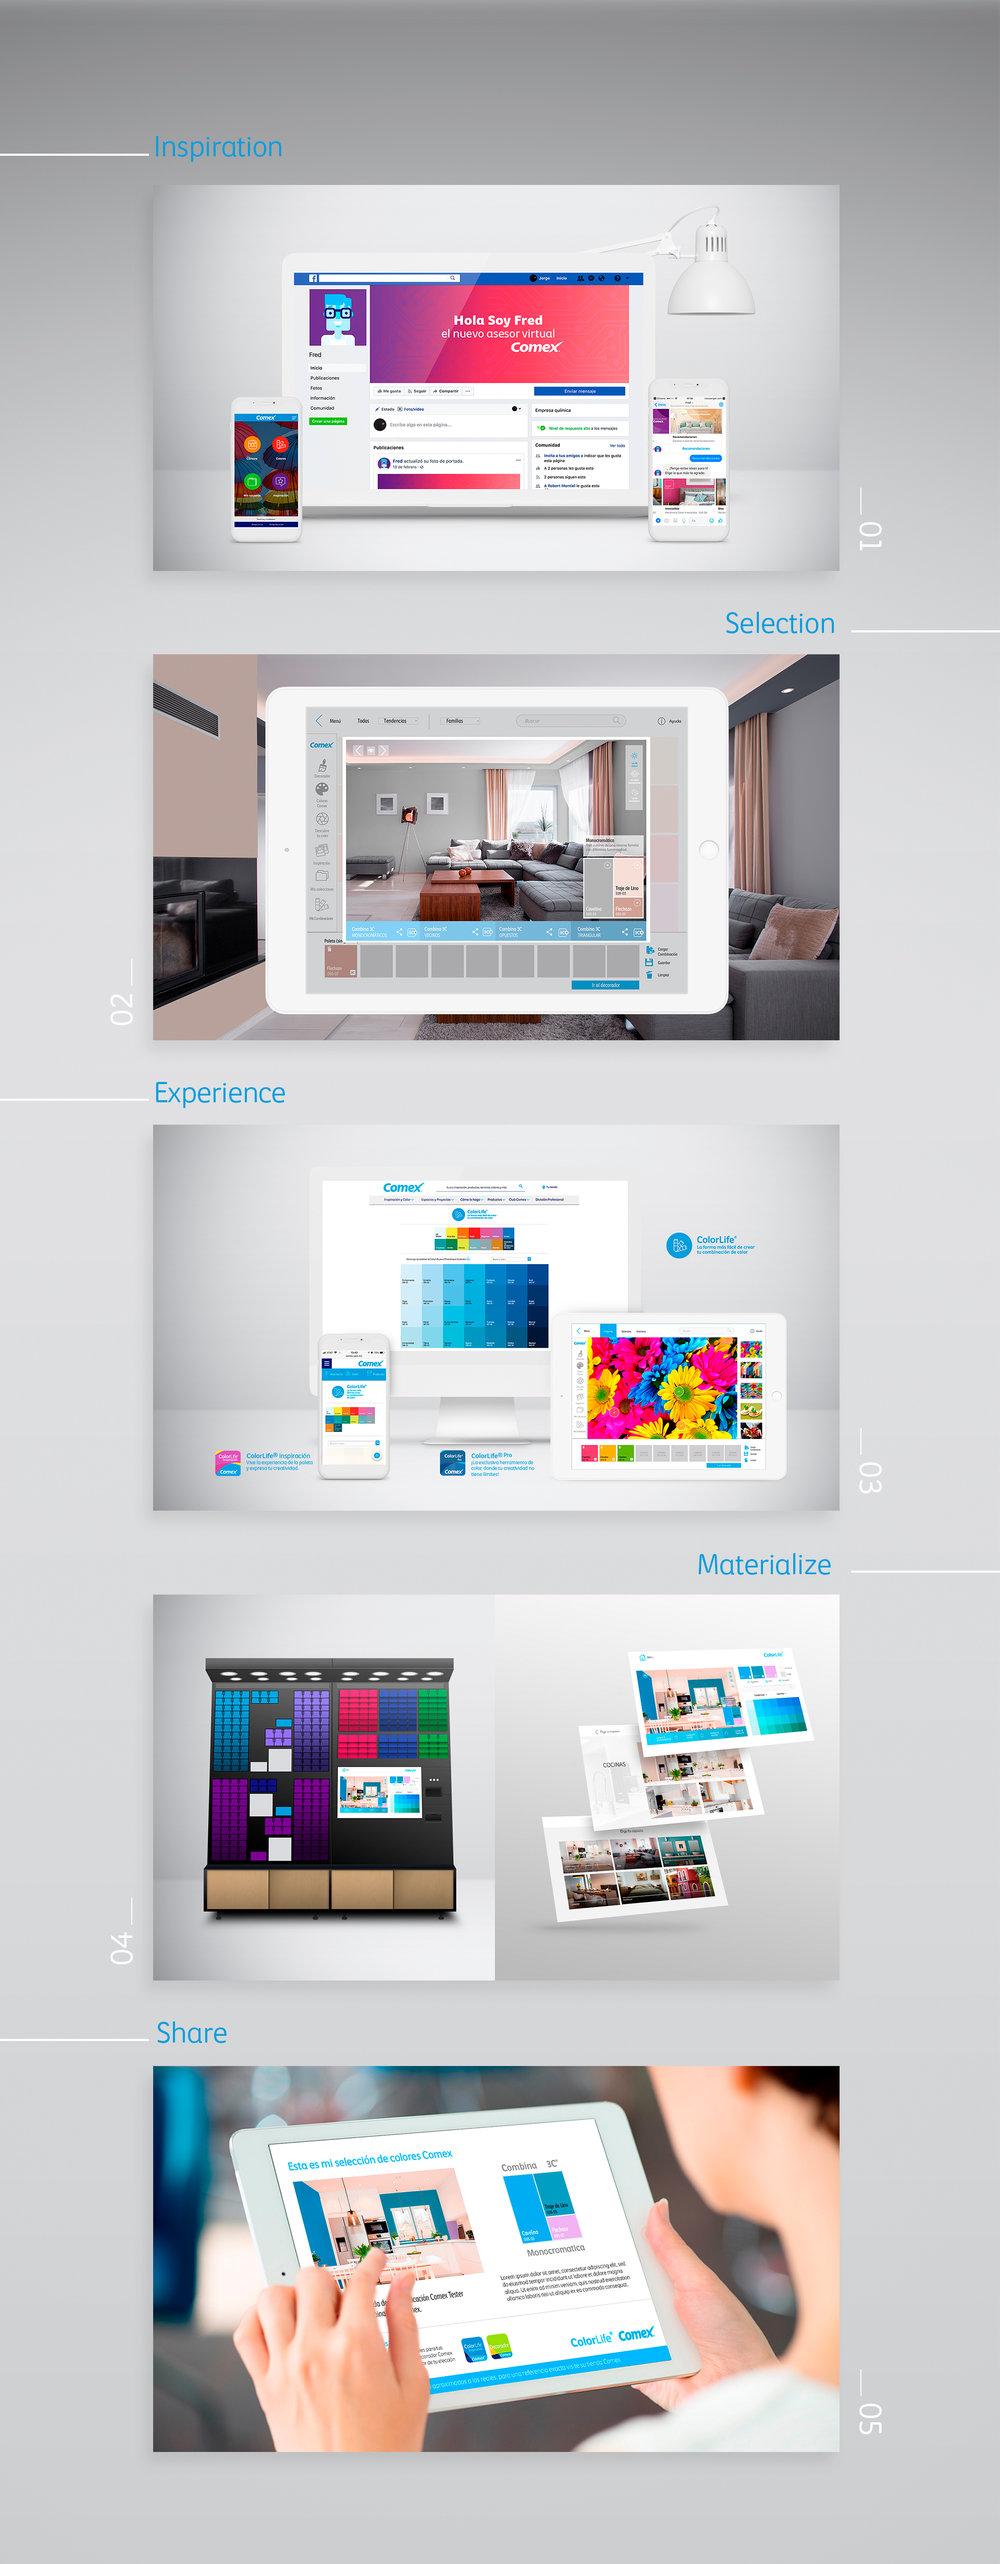 Inspirar_comex (1).jpg